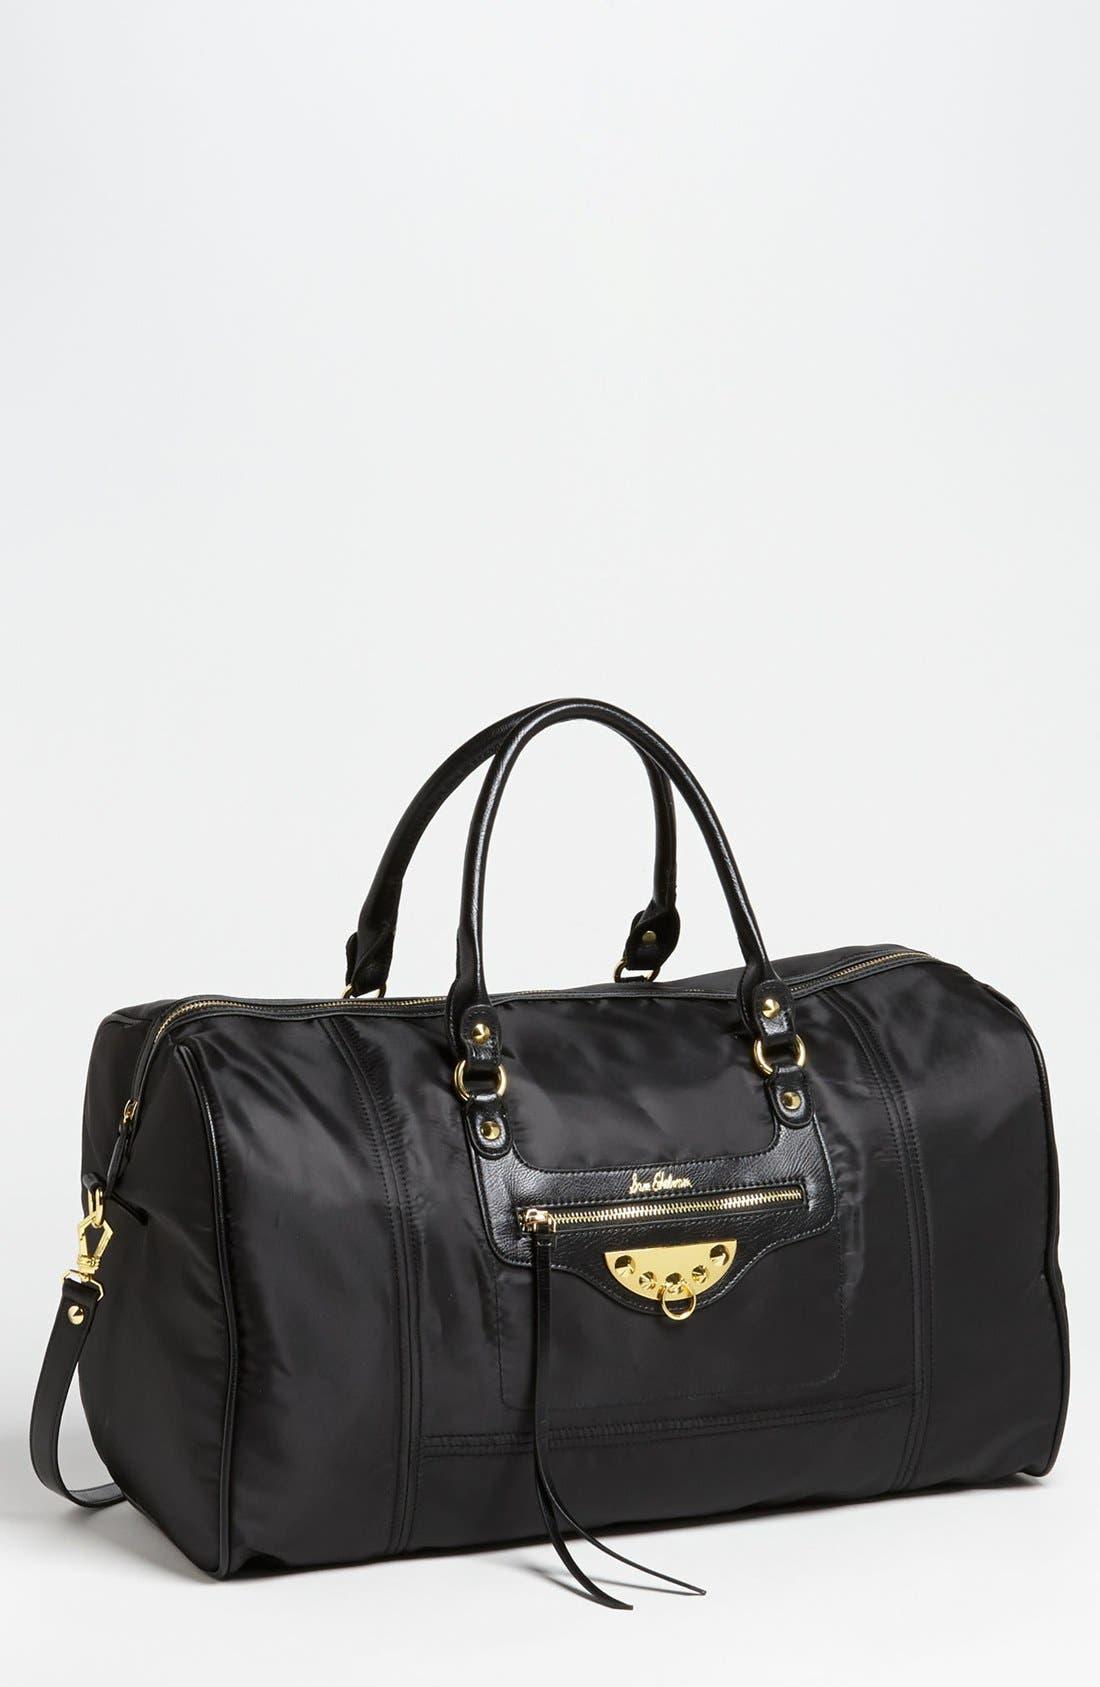 Alternate Image 1 Selected - Sam Edelman 'Marais Alix' Duffel Bag